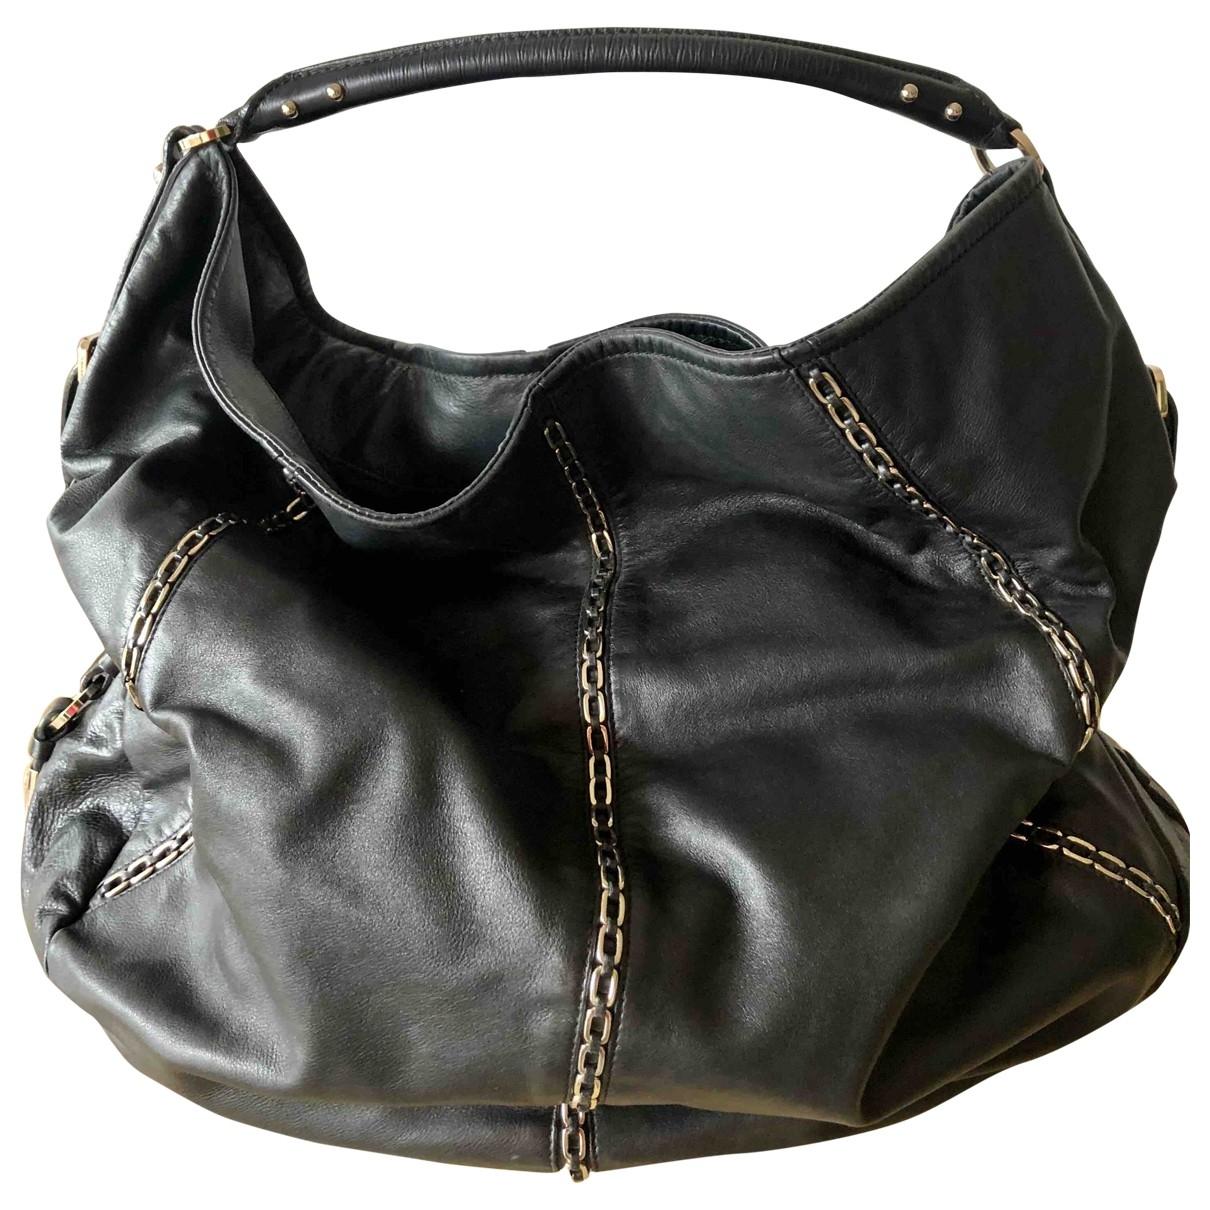 Sergio Rossi \N Black Leather handbag for Women \N